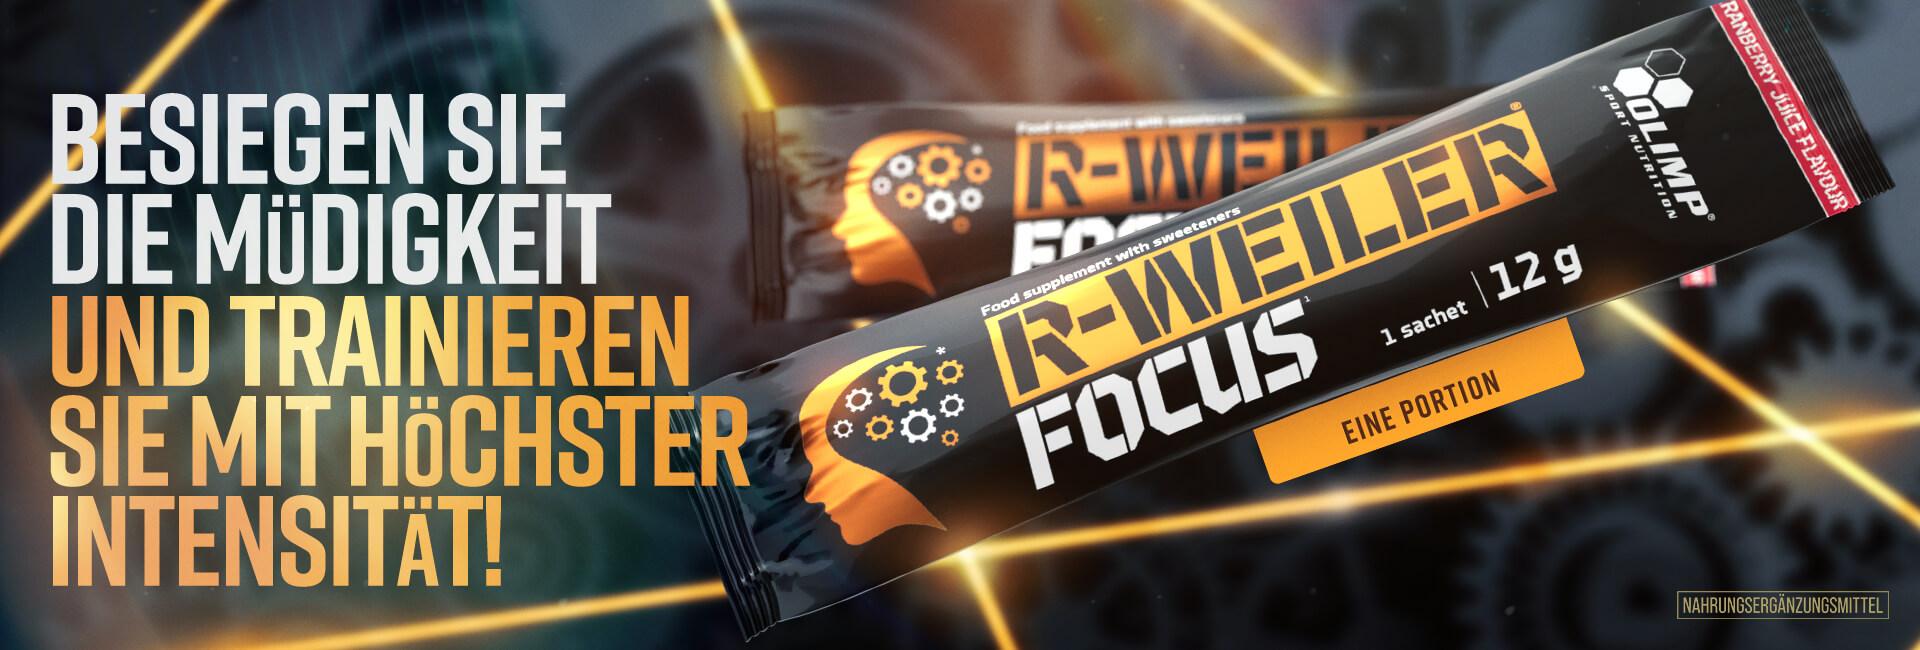 R-WEILER FOCUS STICK